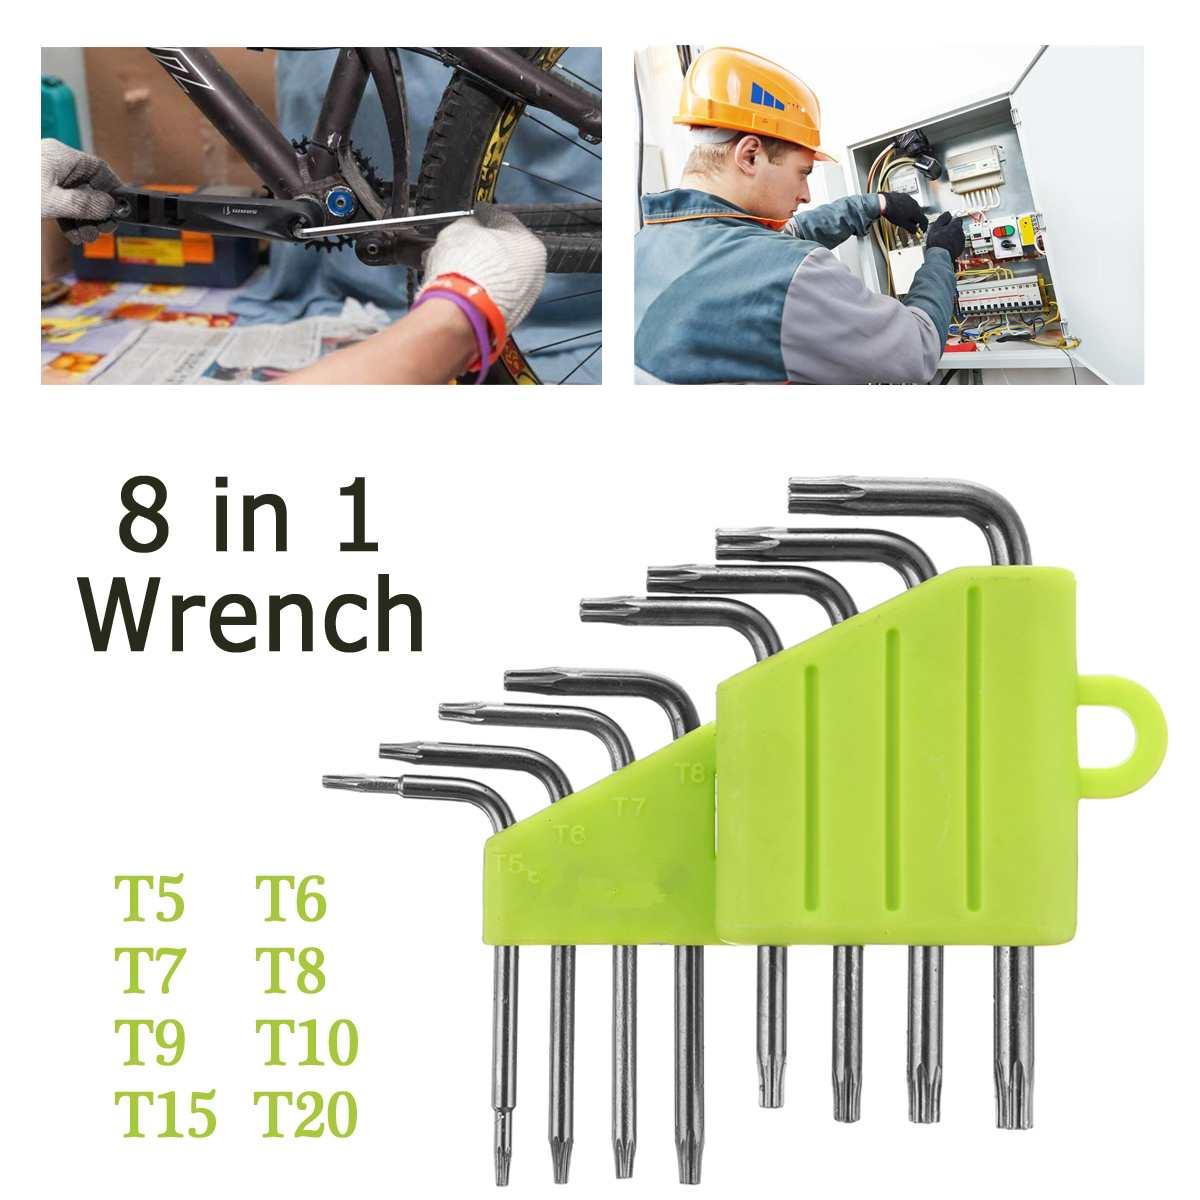 8Pcs Set Durable Metric Short Arm Torx Chrome Vanadium Key Star Wrench Hand Tool Screwdriver T5/T6/T7/T8/T9/T10/T15/T20